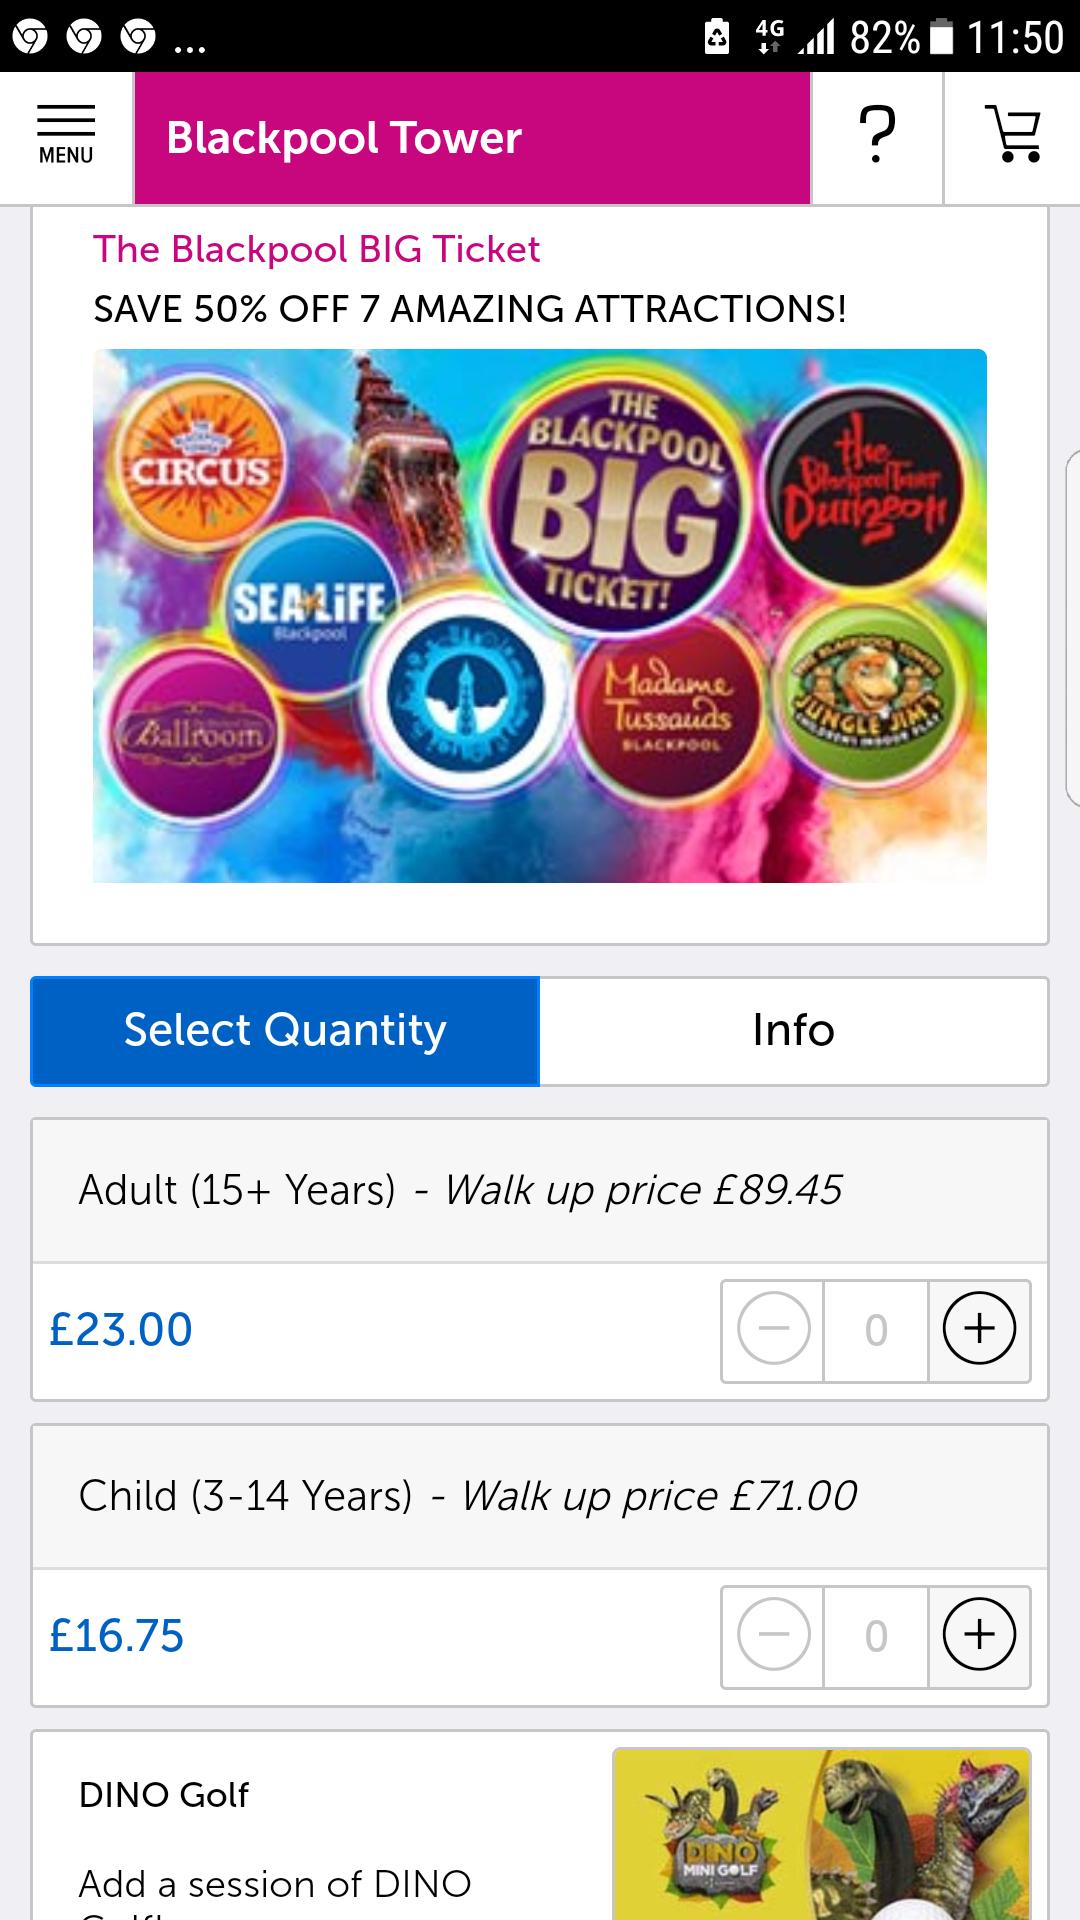 Blackpool Merlin Attractions Pass BIG TICKET!! £23